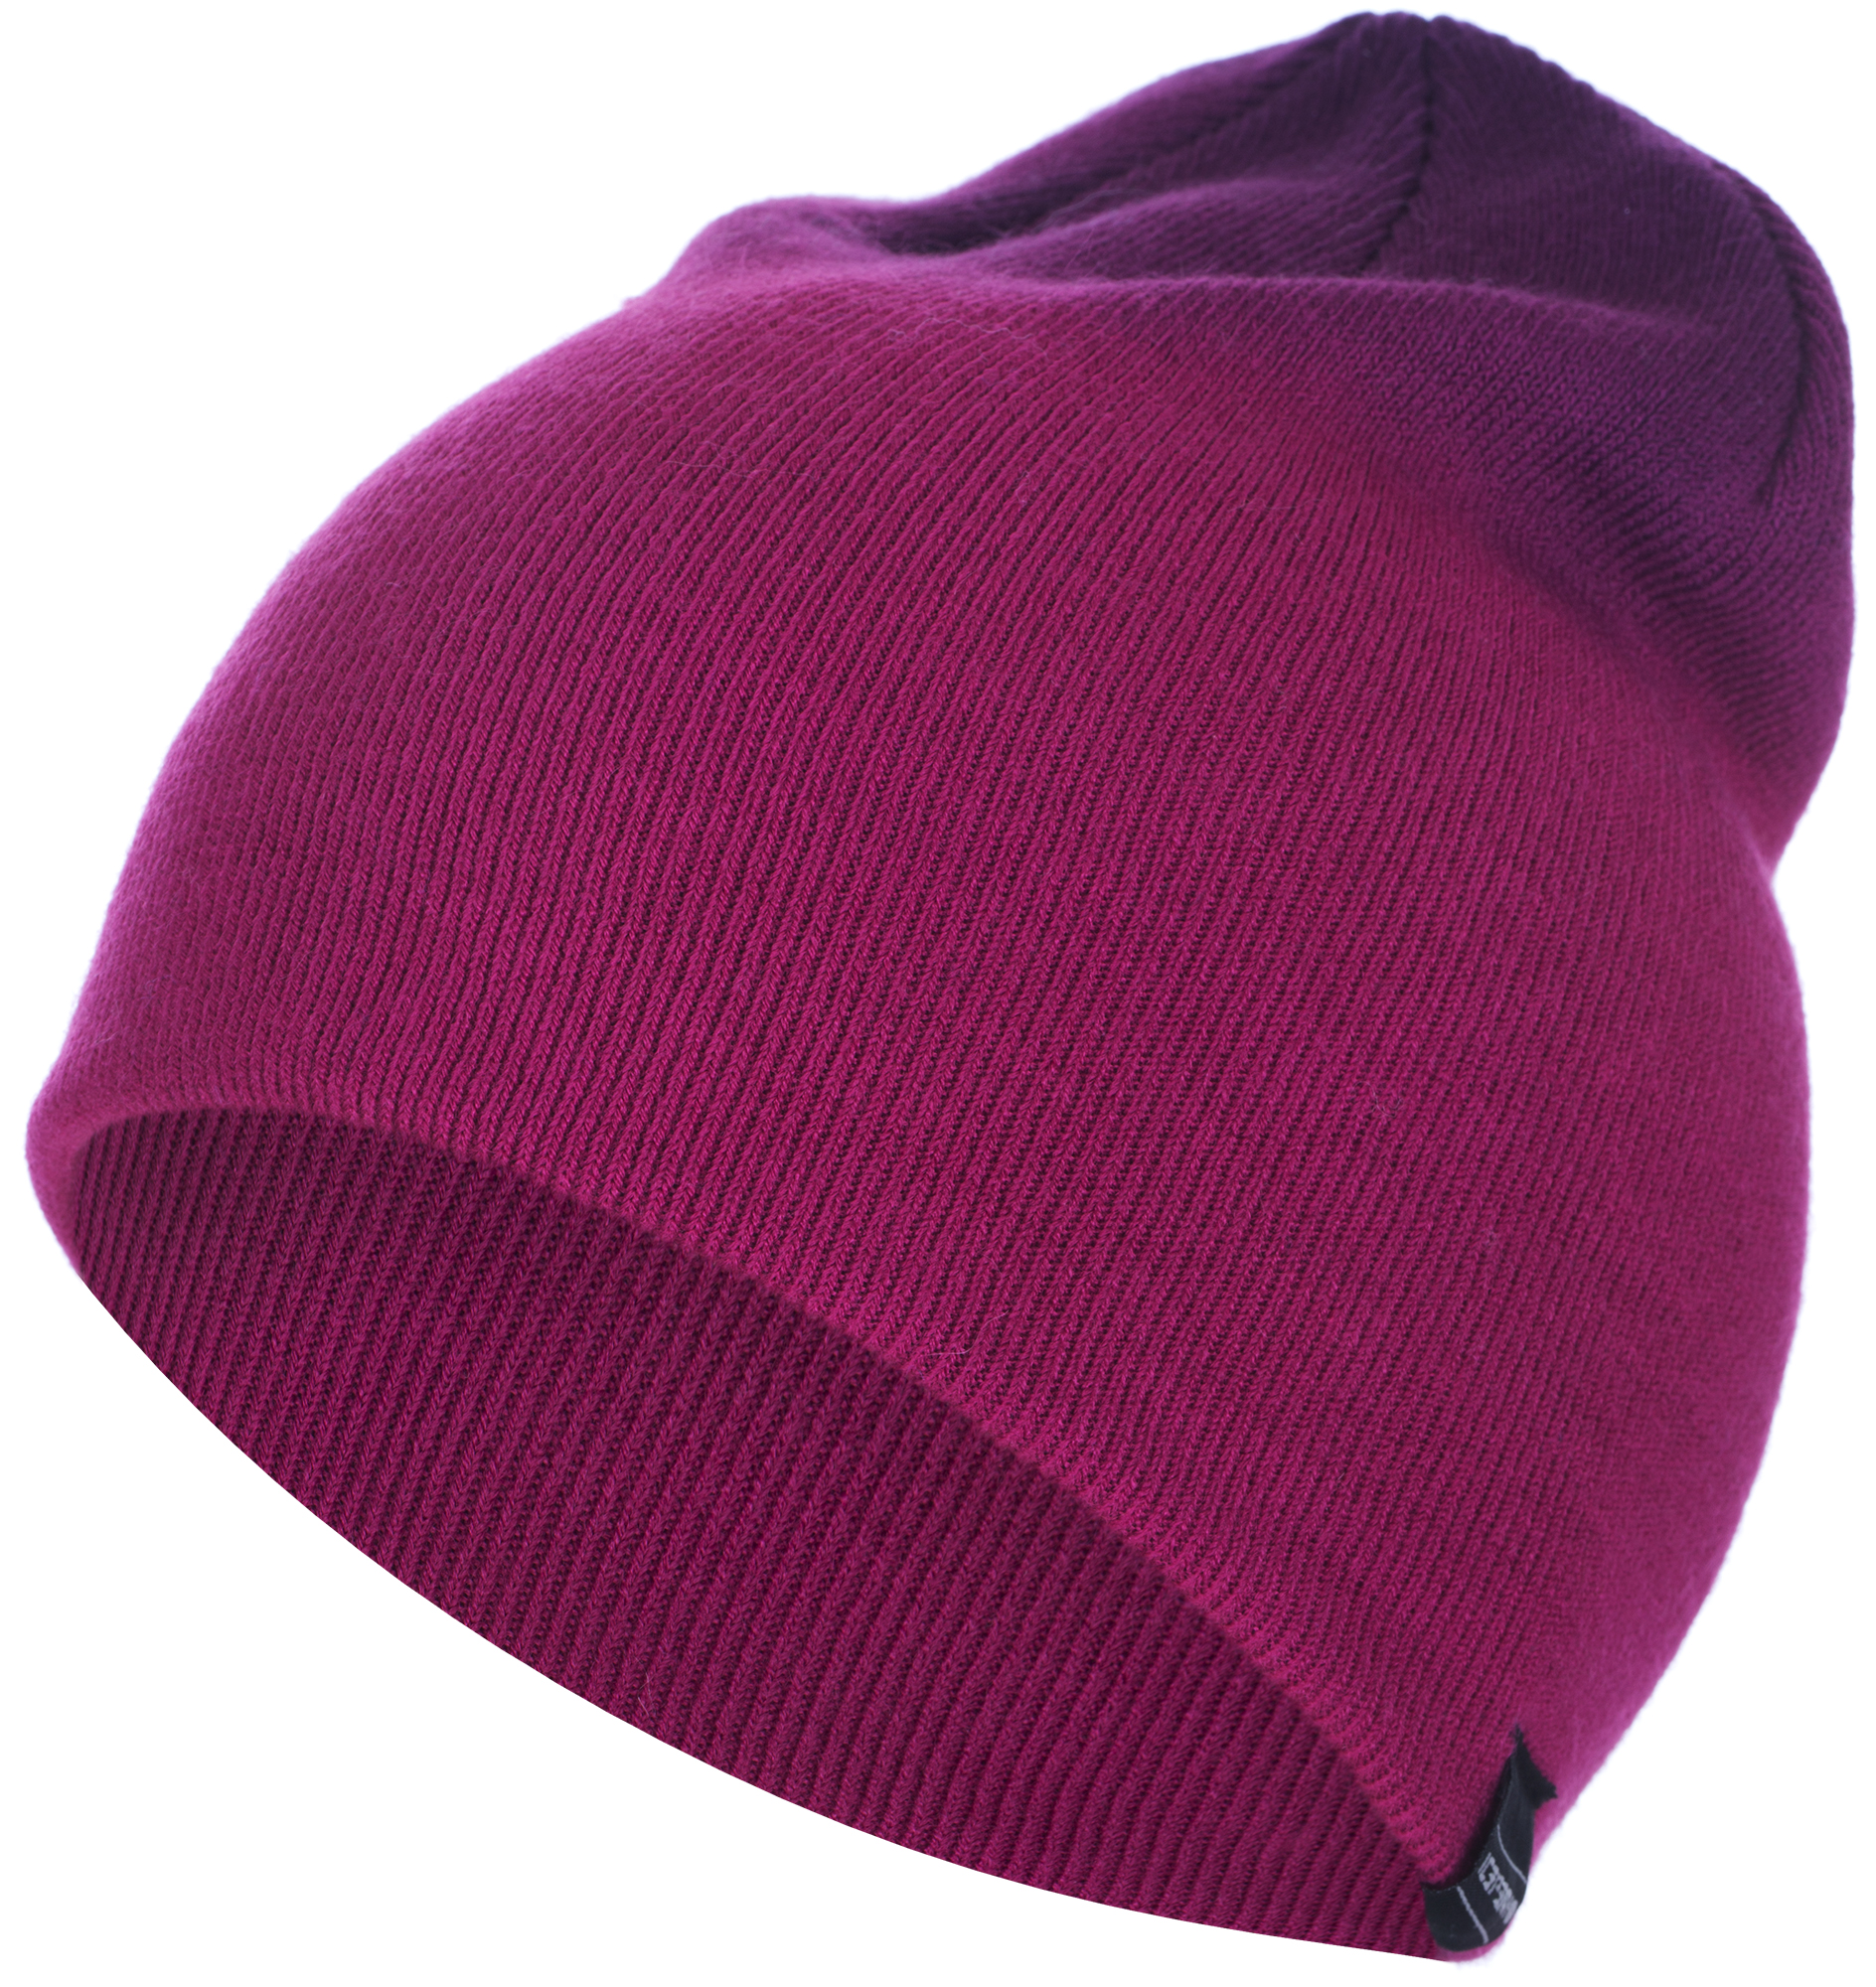 IcePeak Шапка для девочек IcePeak Maleno, размер Без размера icepeak шапка мужская icepeak iolo размер без размера